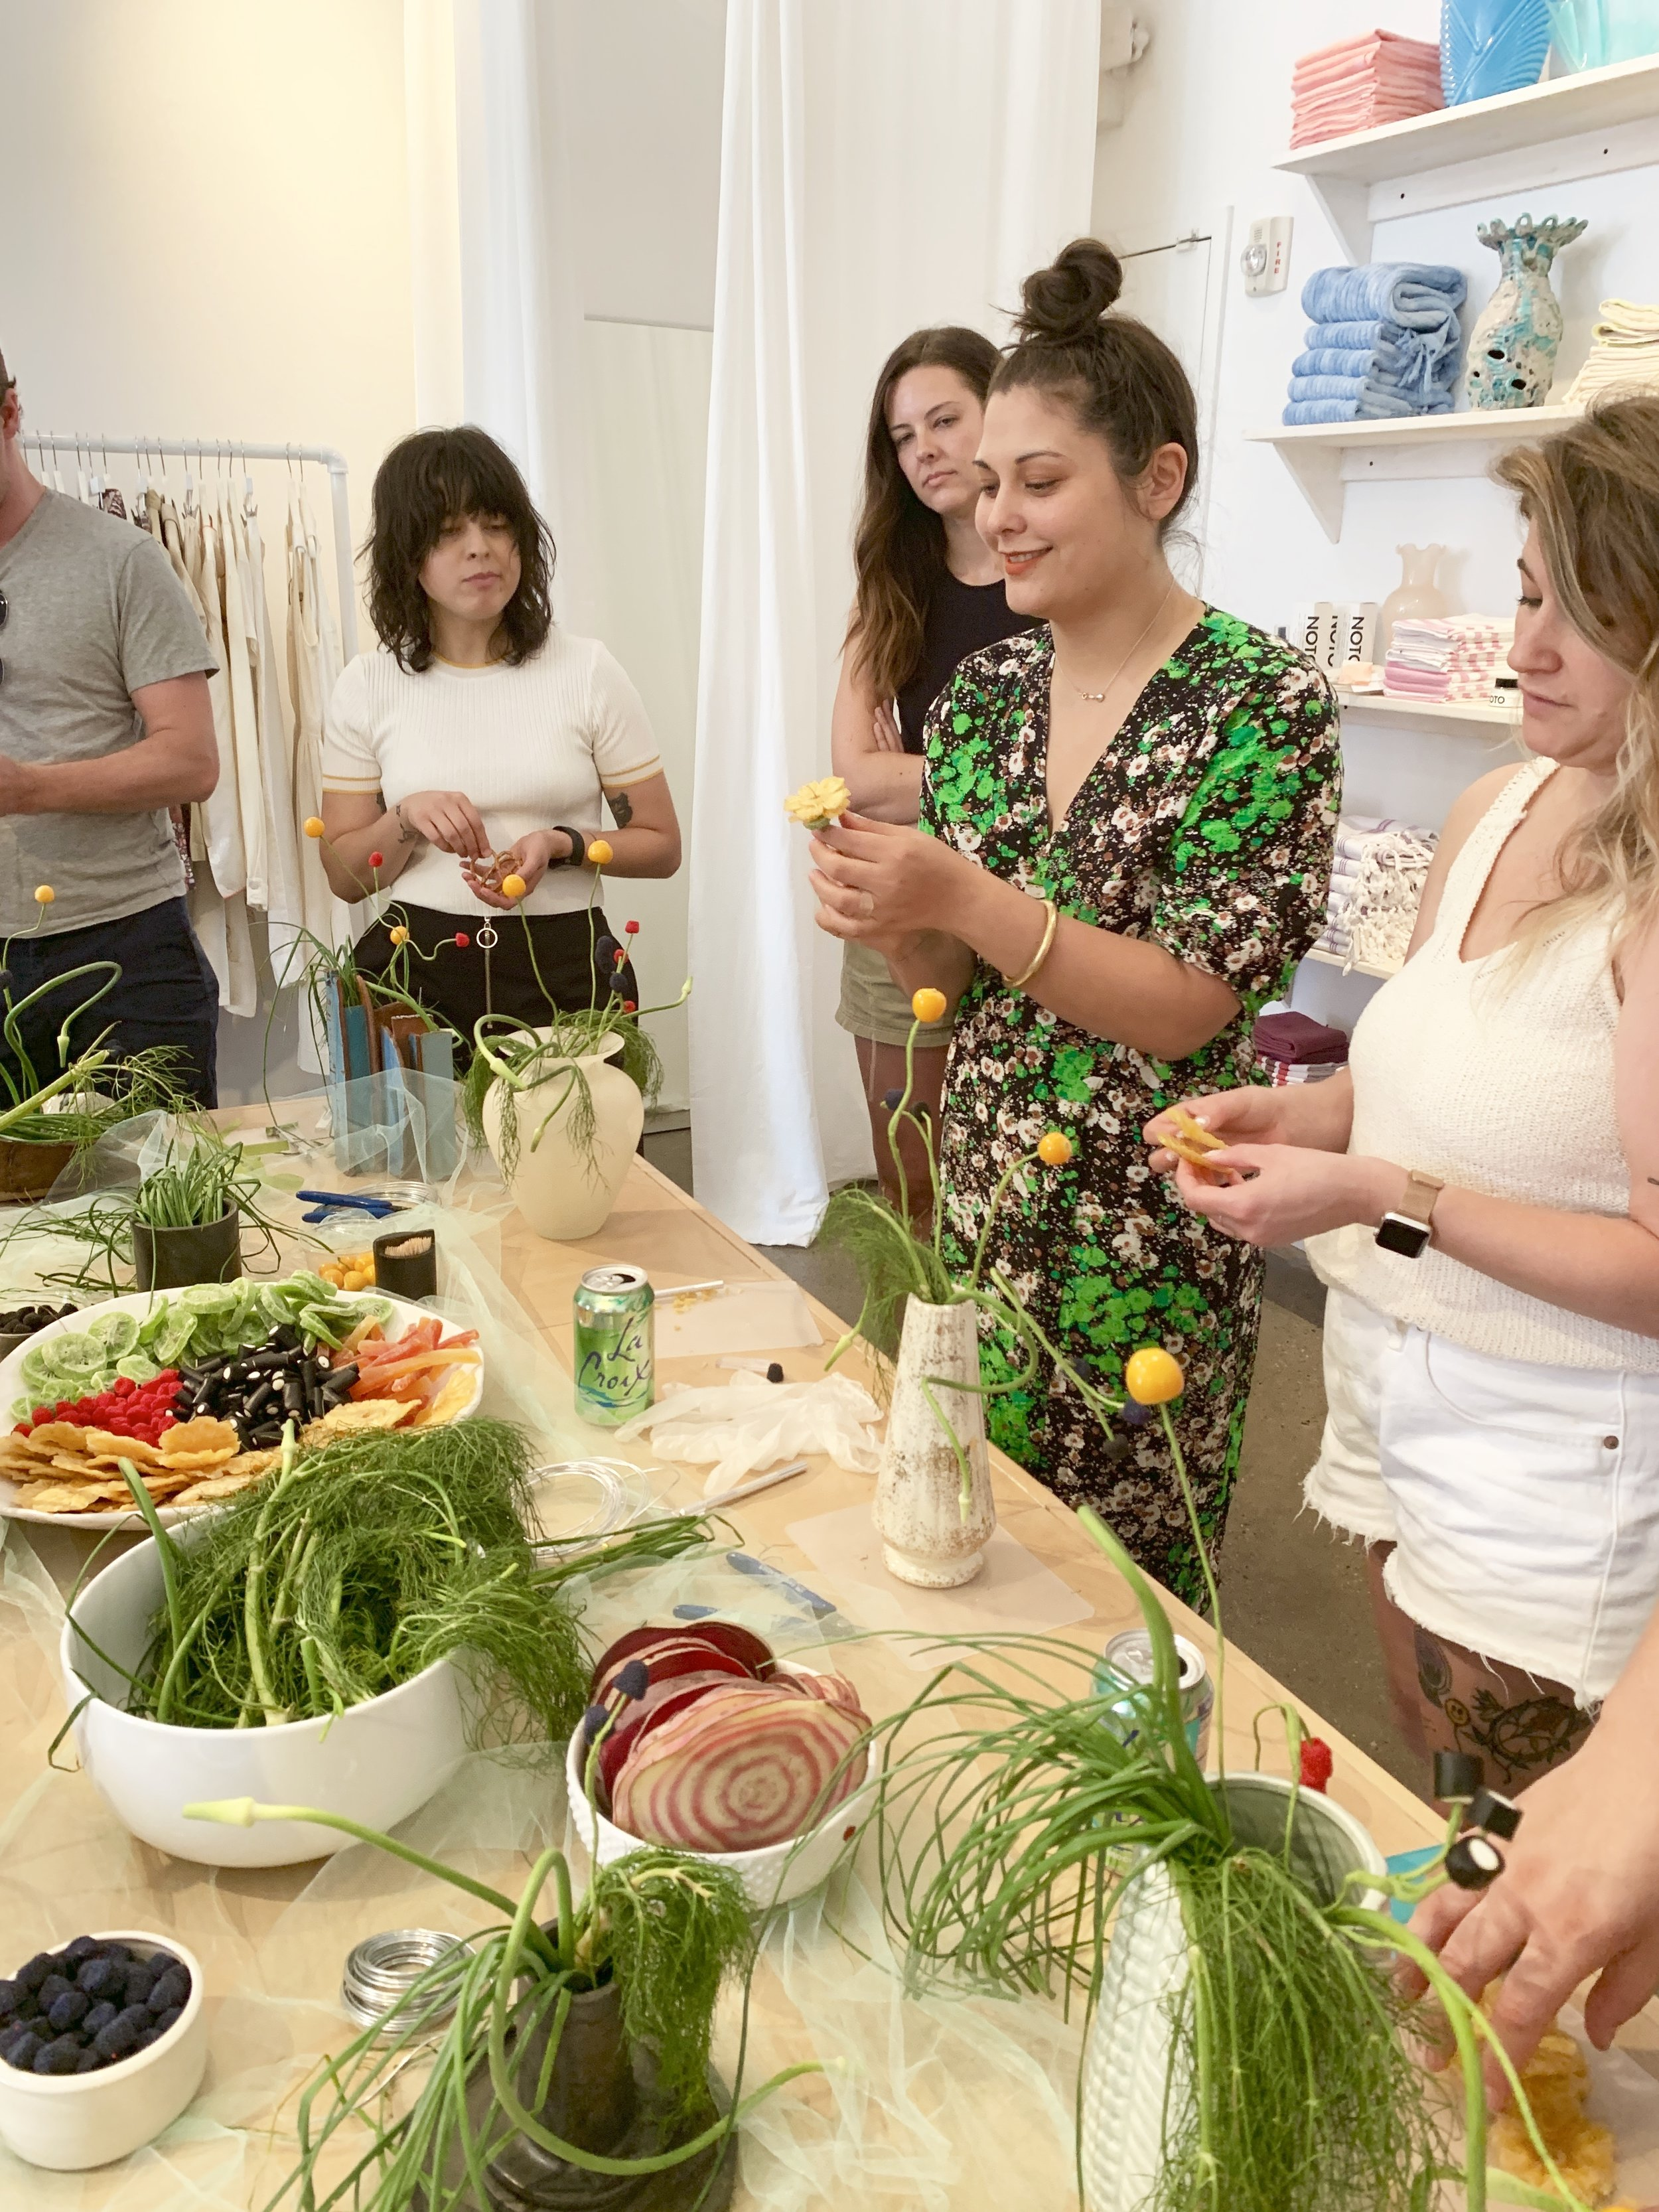 Workshop: Edible Ikebana